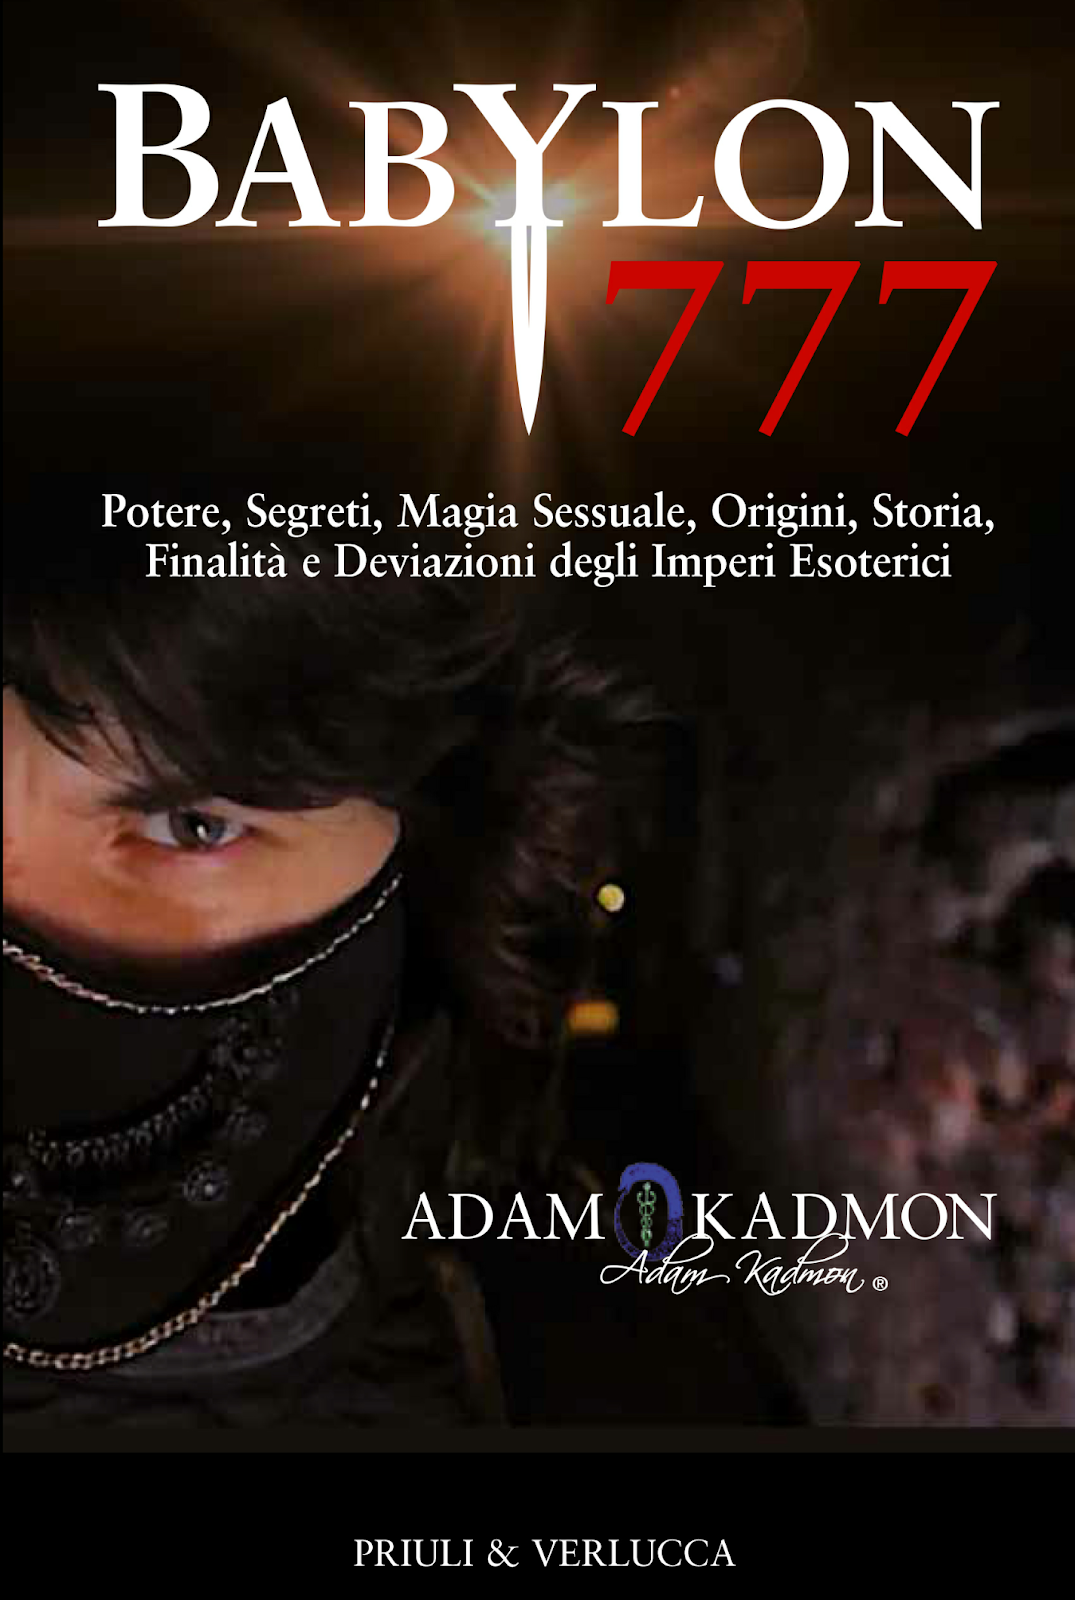 BABYLON 777 il Bestseller scritto da Adam Kadmon (2018)